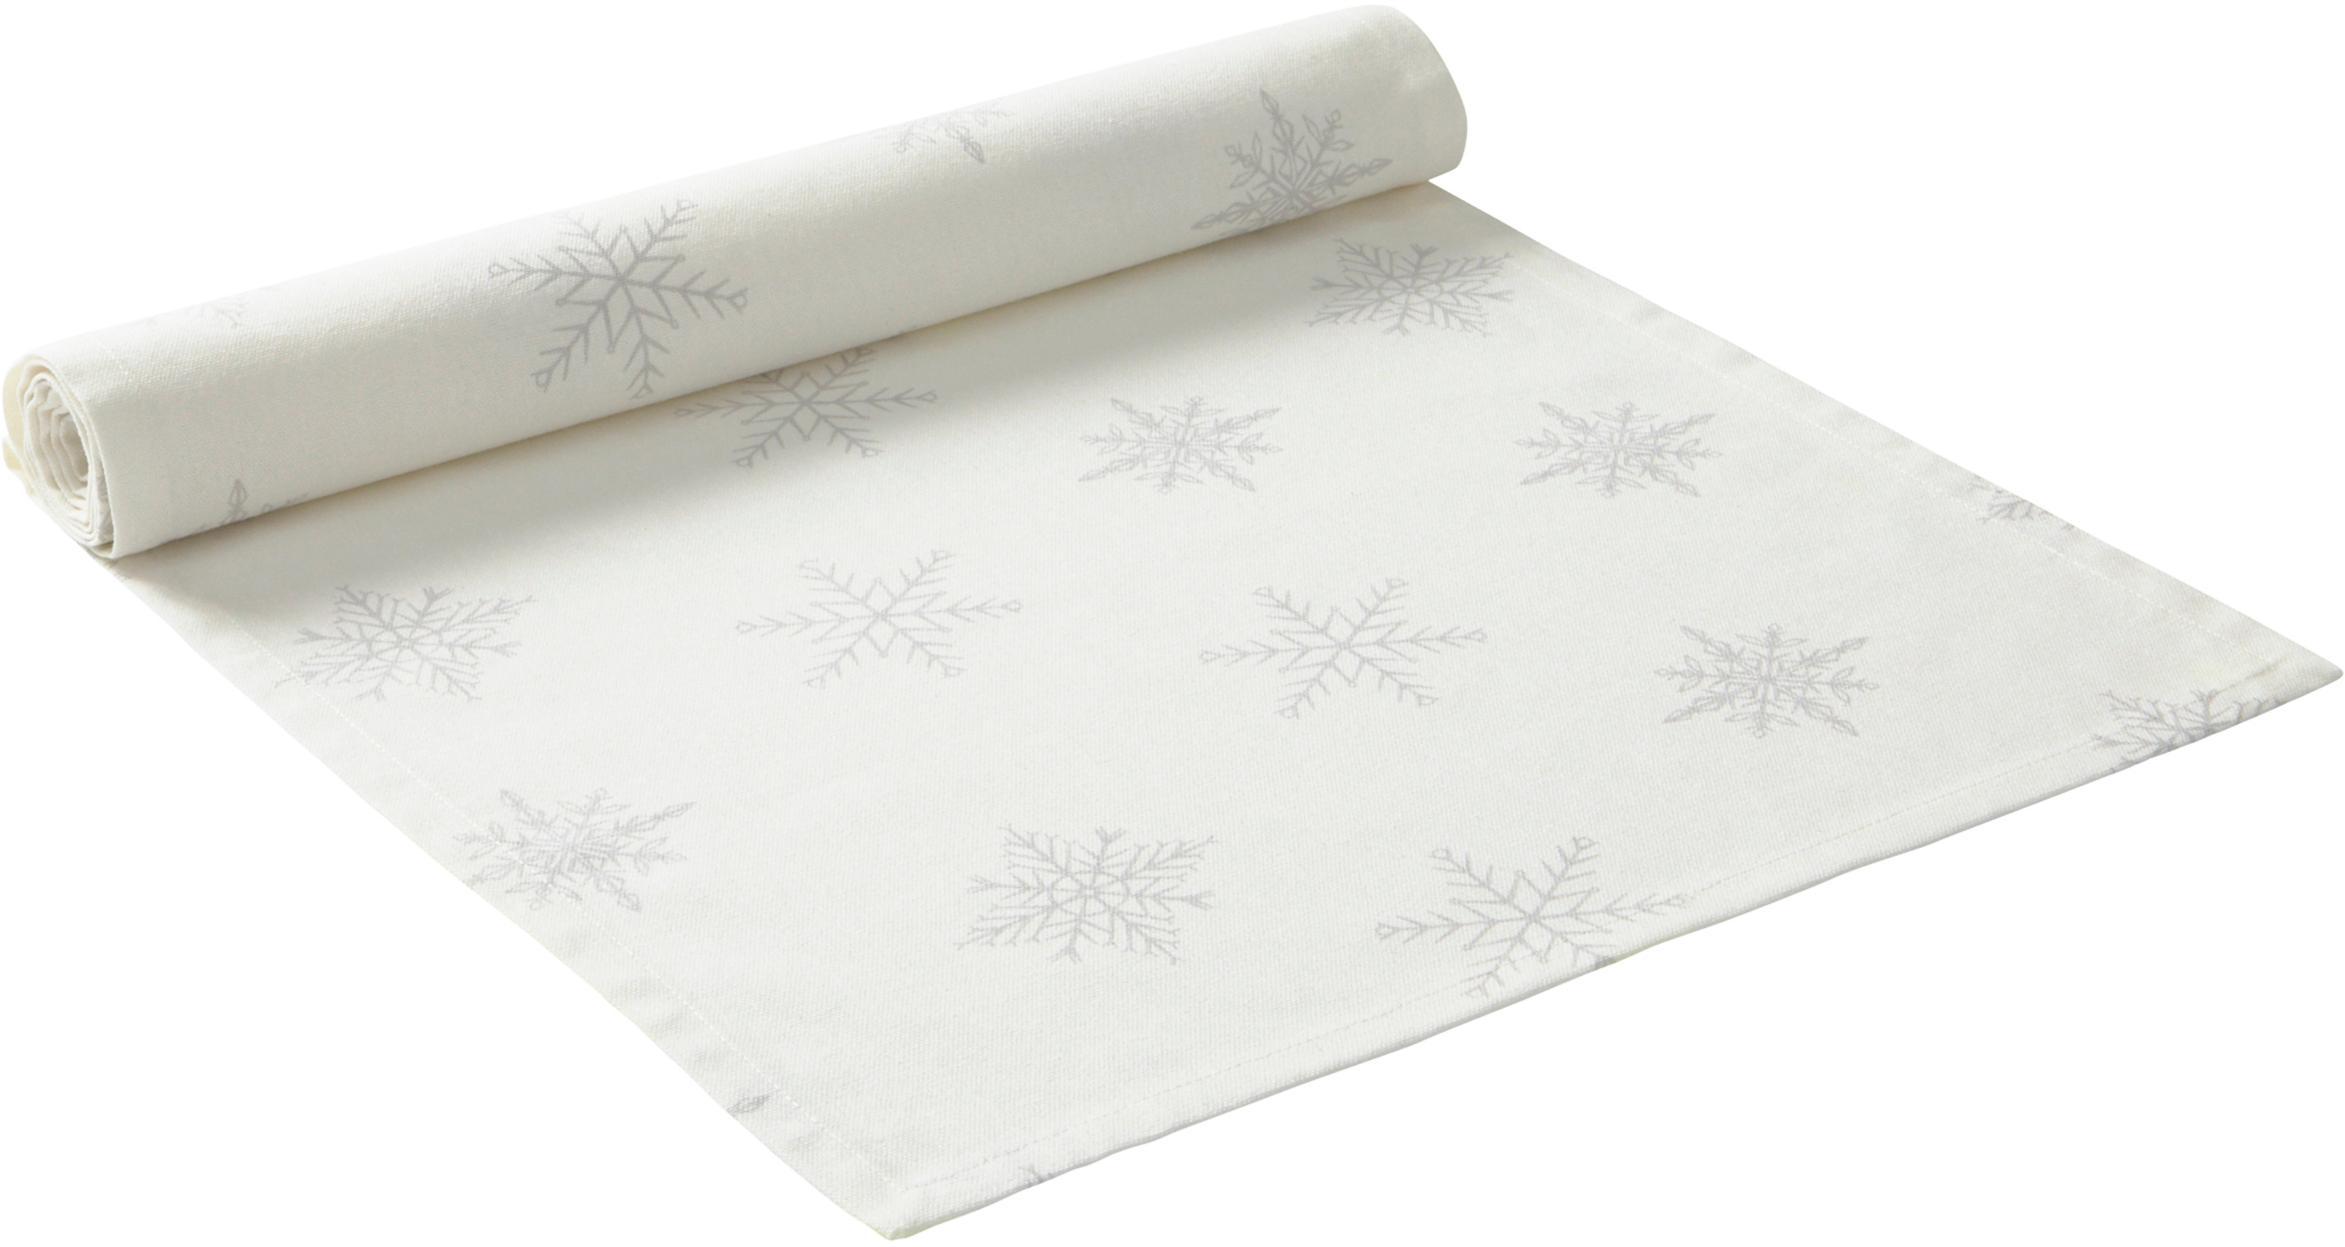 Tafelloper Snow, 100% katoen, afkomstig van duurzame katoenteelt, Crèmewit, lichtgrijs, 40 x 140 cm